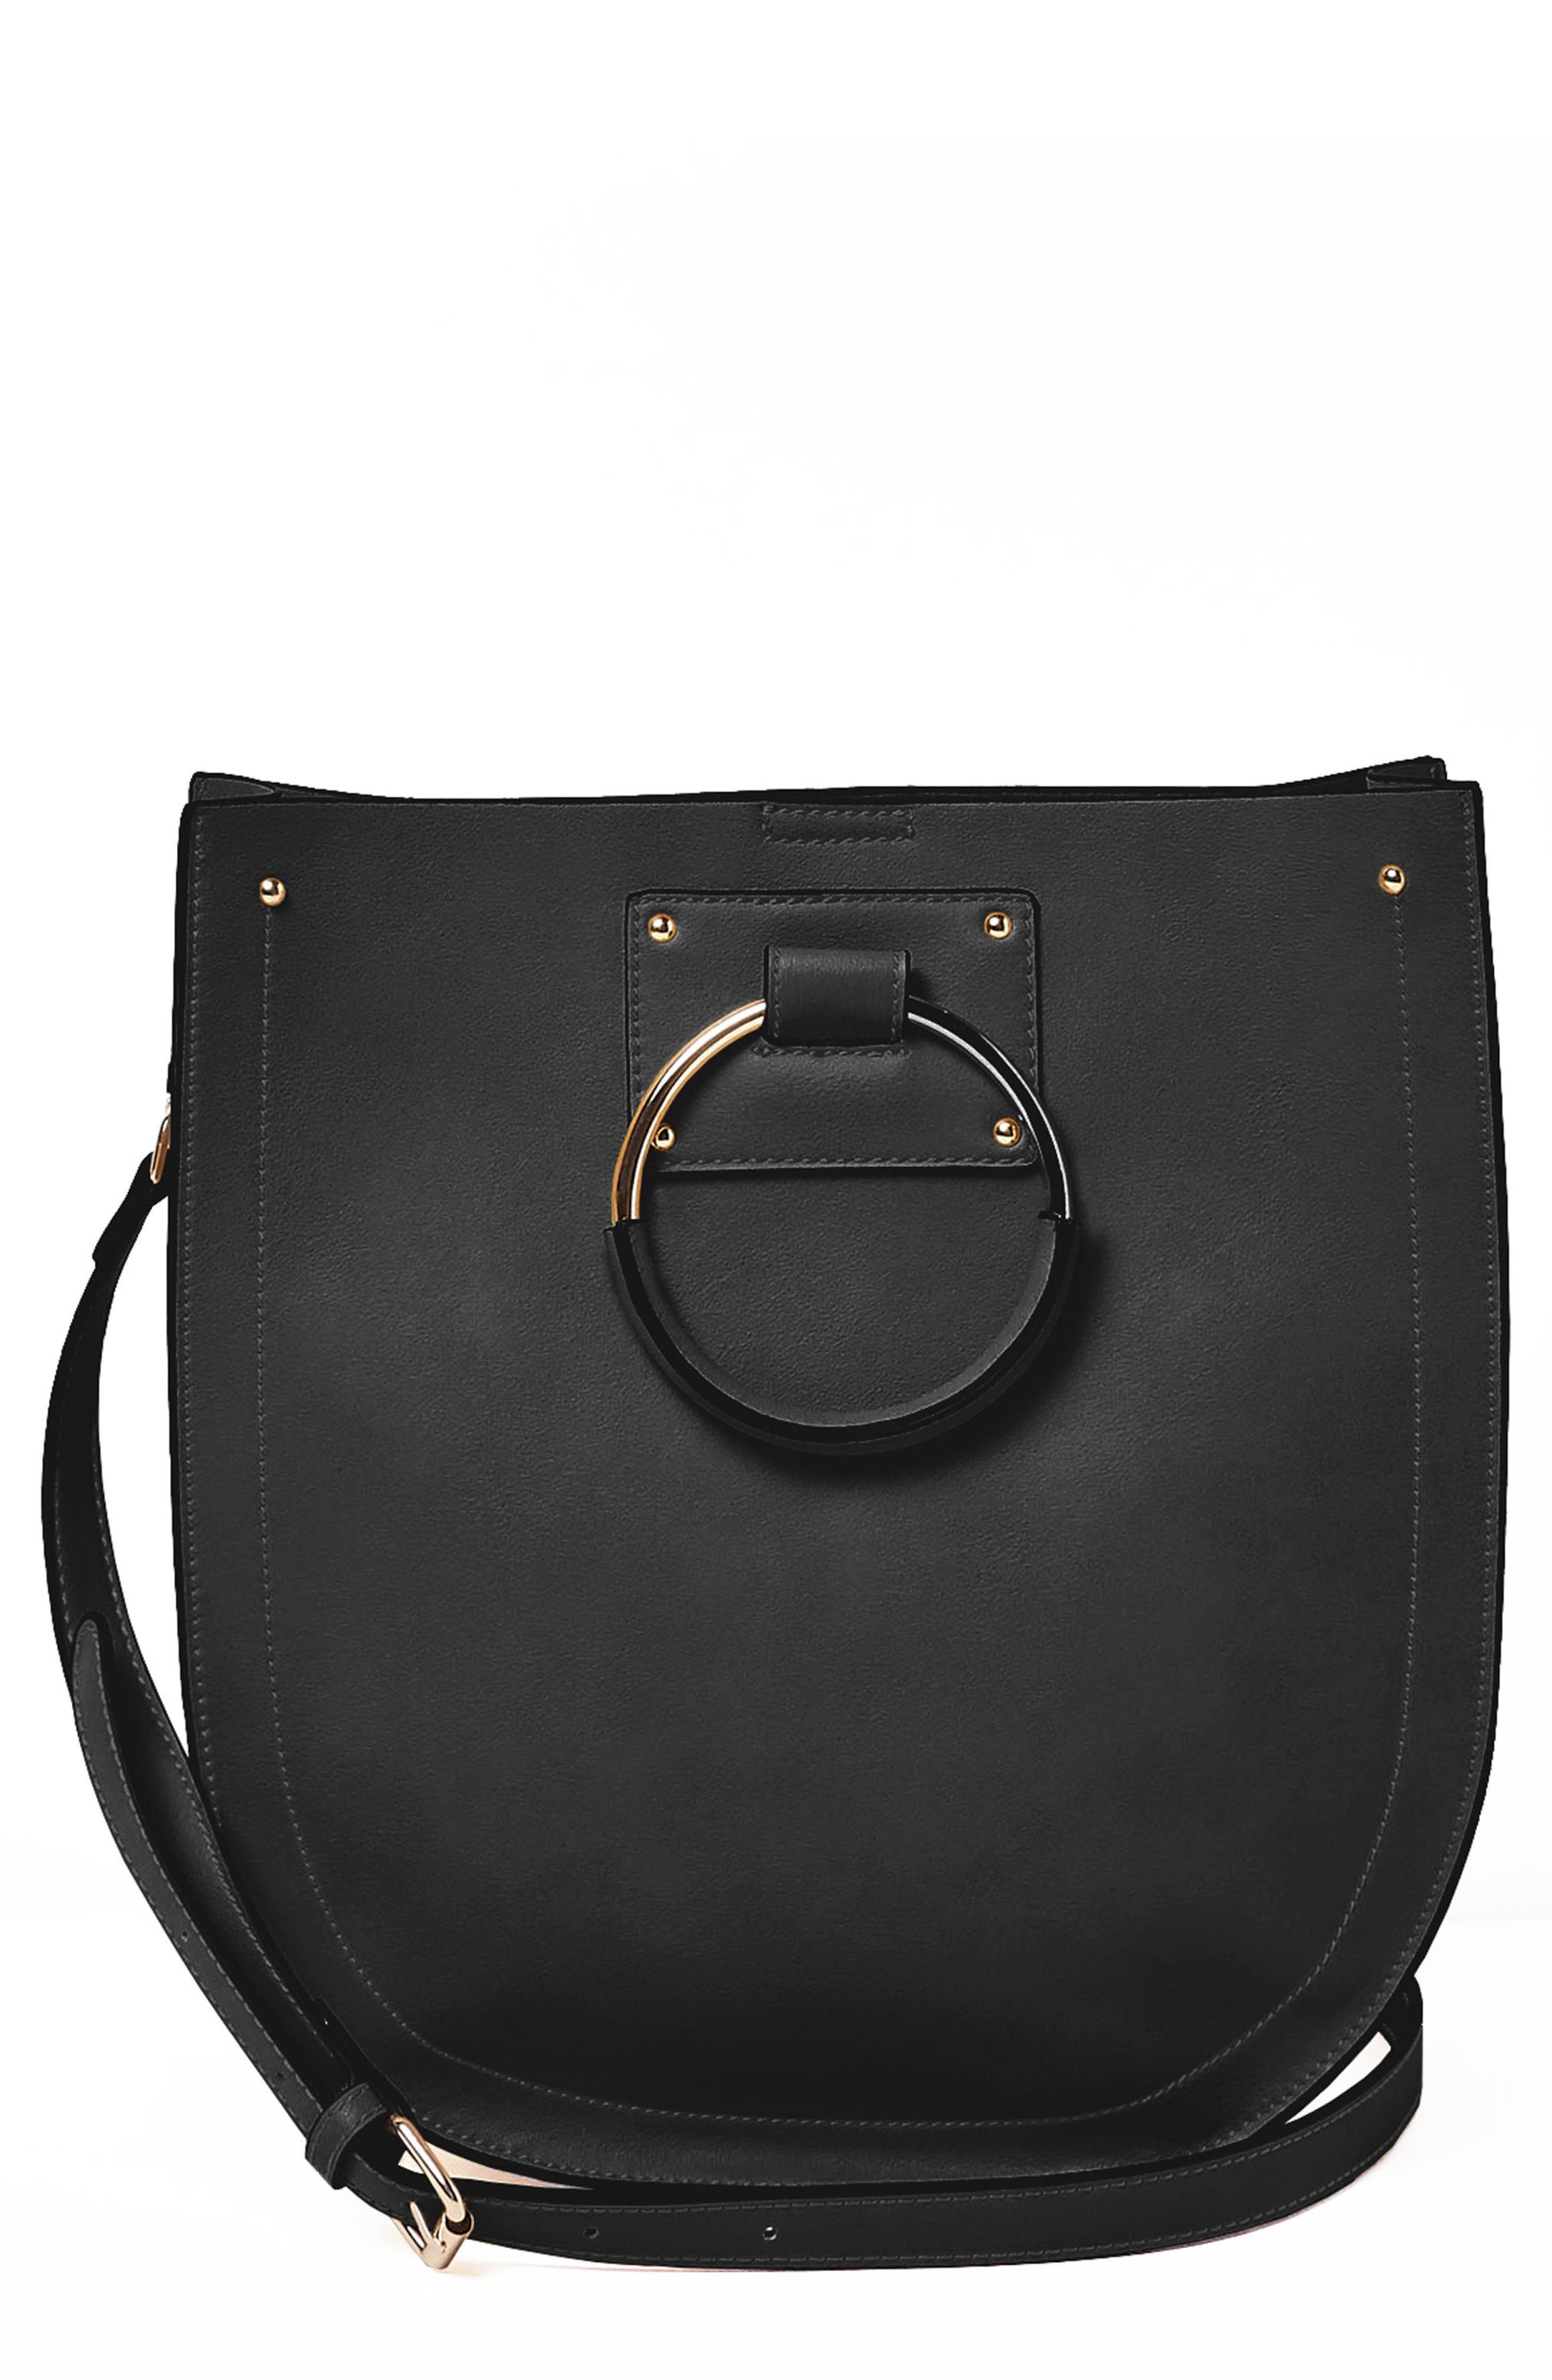 Nordic Dream Vegan Leather Shoulder Bag,                             Main thumbnail 1, color,                             Black